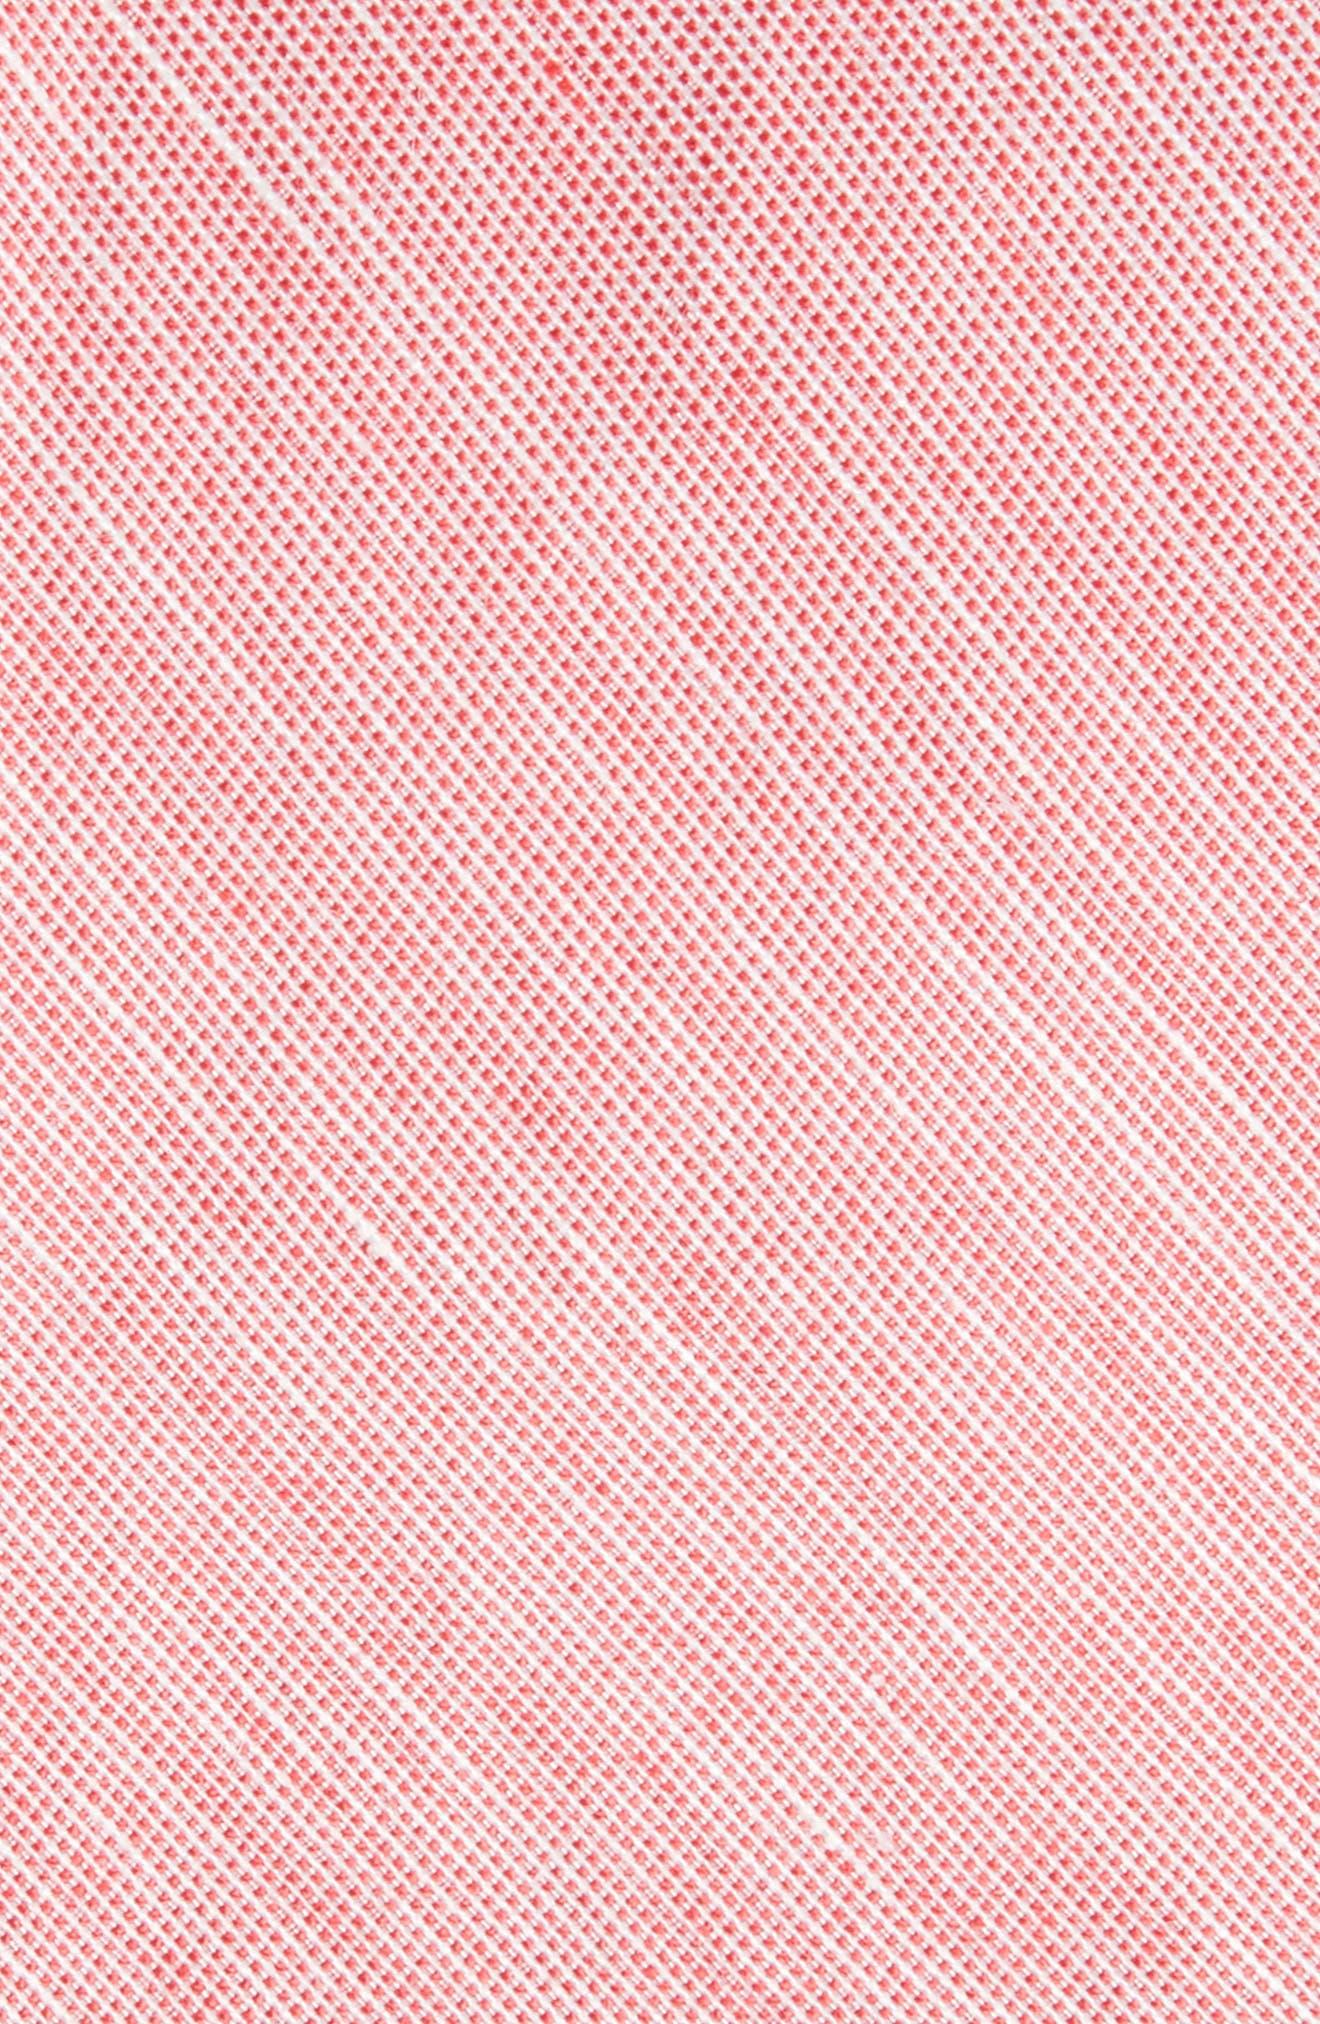 Adena Solid Silk Blend Skinny Tie,                             Alternate thumbnail 2, color,                             Red